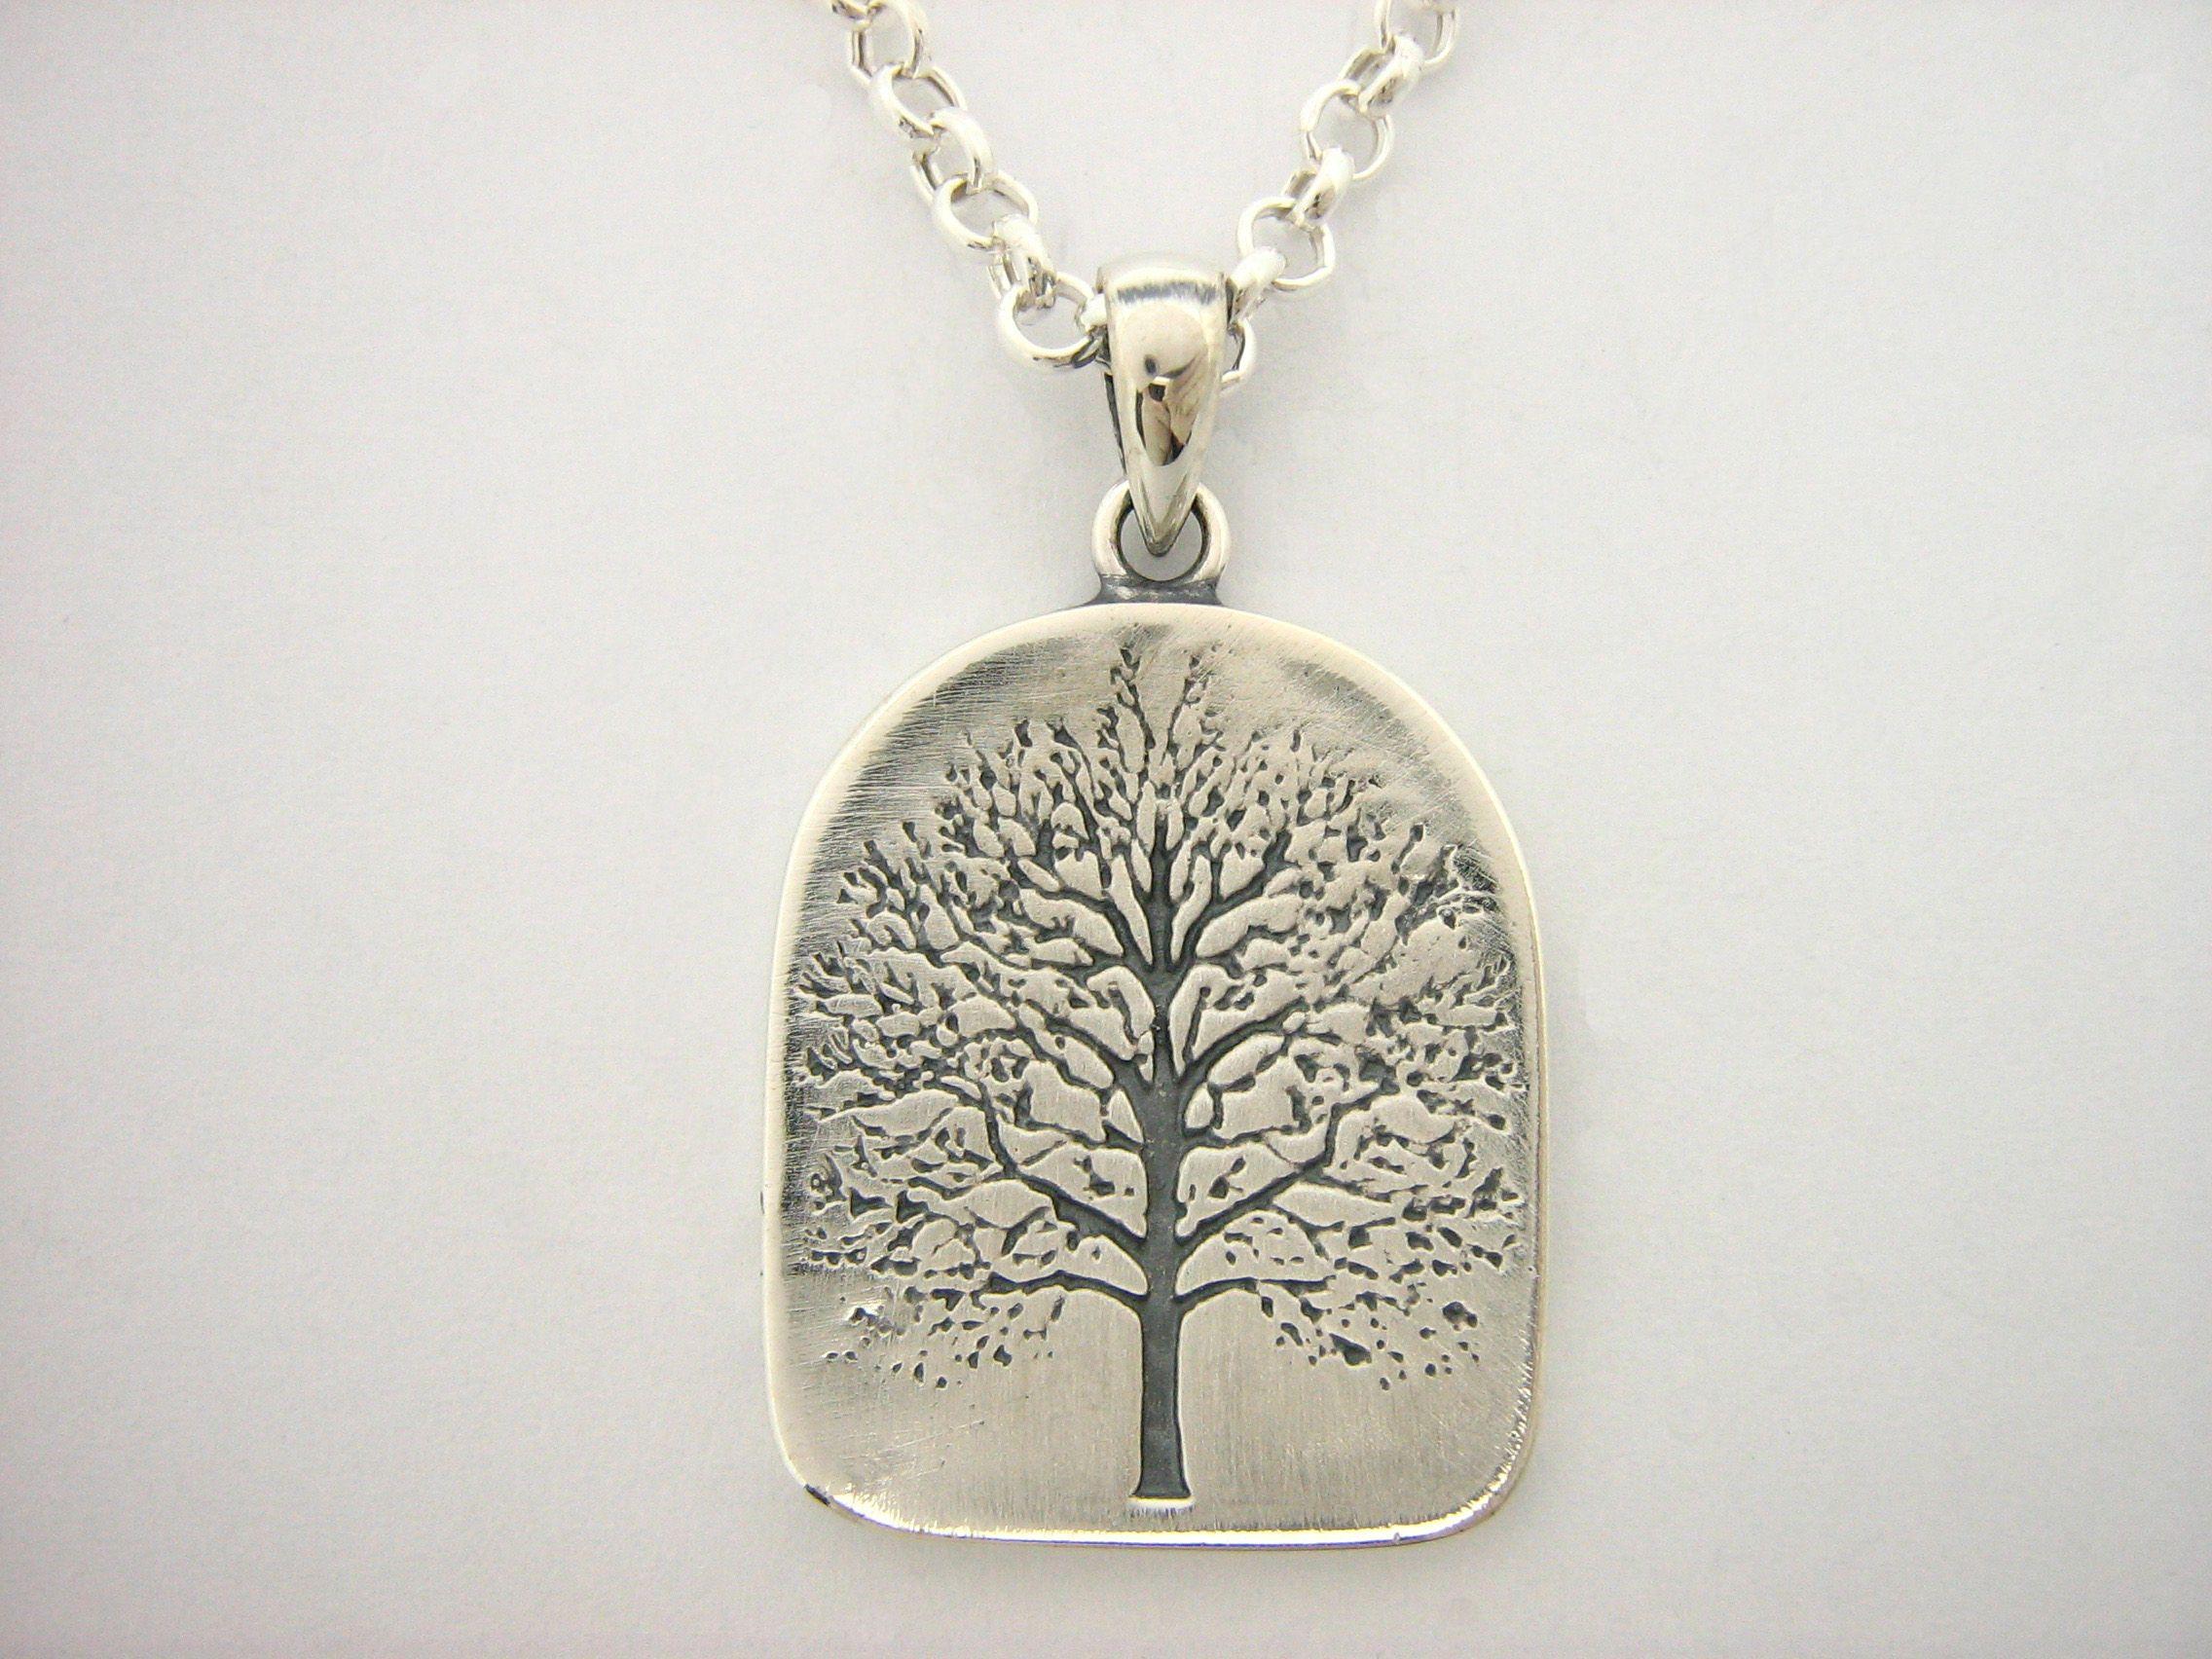 Custom sterling silver world tree of life amulet pendant by mava custom made sterling silver world tree of life amulet pendant aloadofball Images